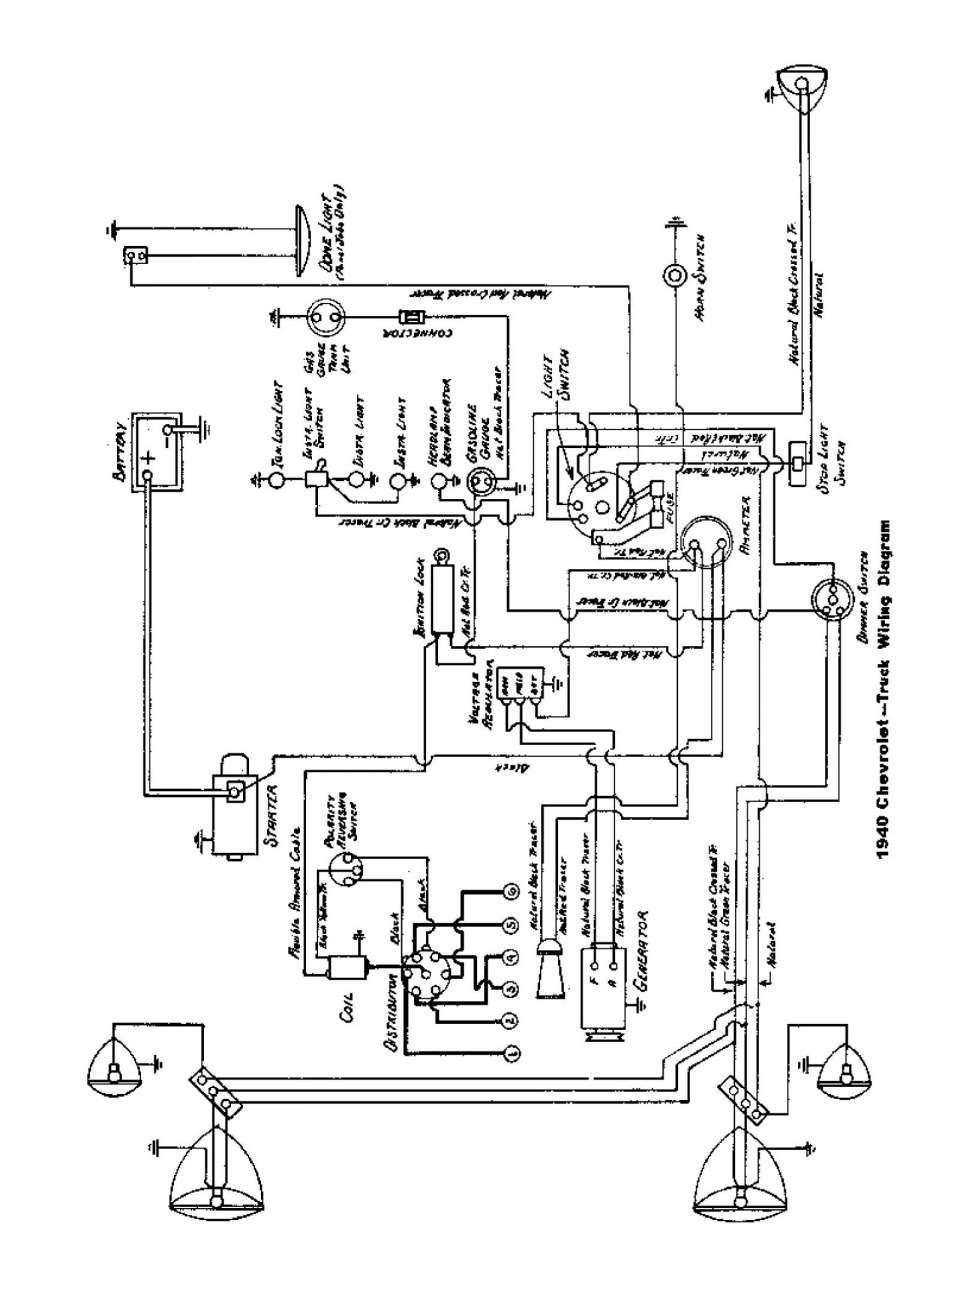 17 1960 Chevy Truck Wiring Diagram 57 Chevy Trucks 1946 Chevy Truck Chevy Trucks